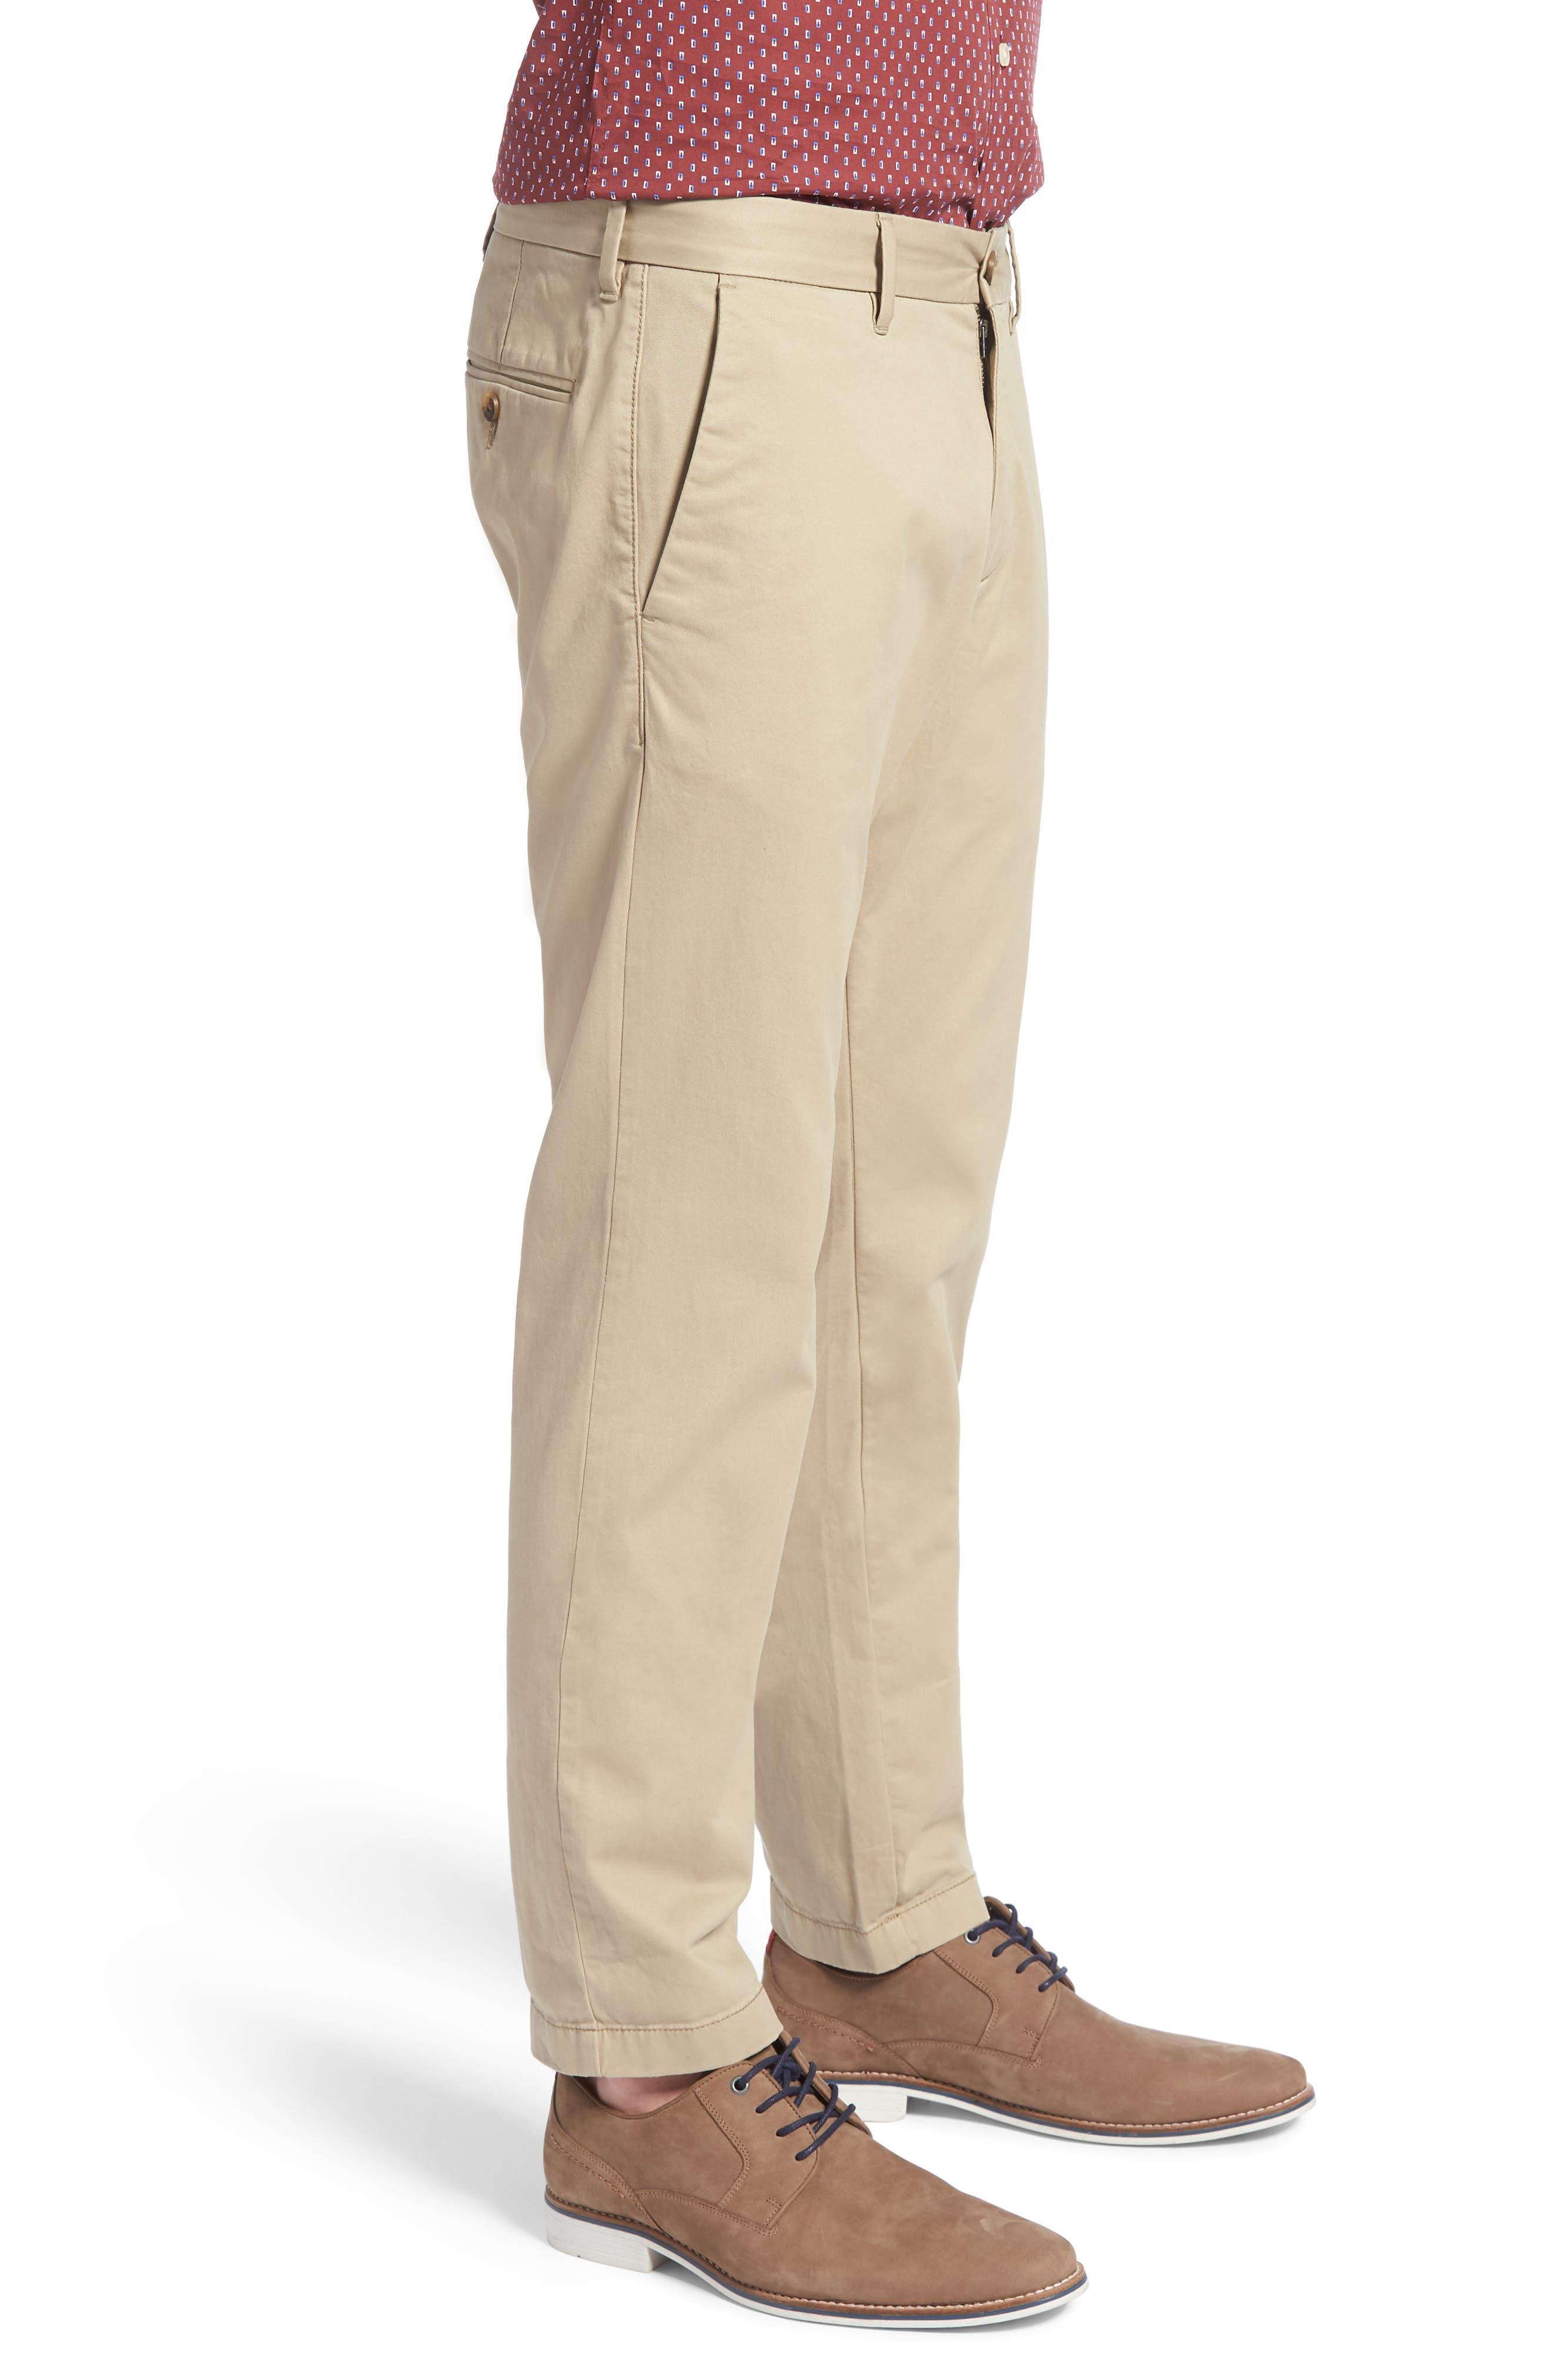 Ballard Slim Fit Stretch Chino Pants,                             Alternate thumbnail 3, color,                             Tan Burrow